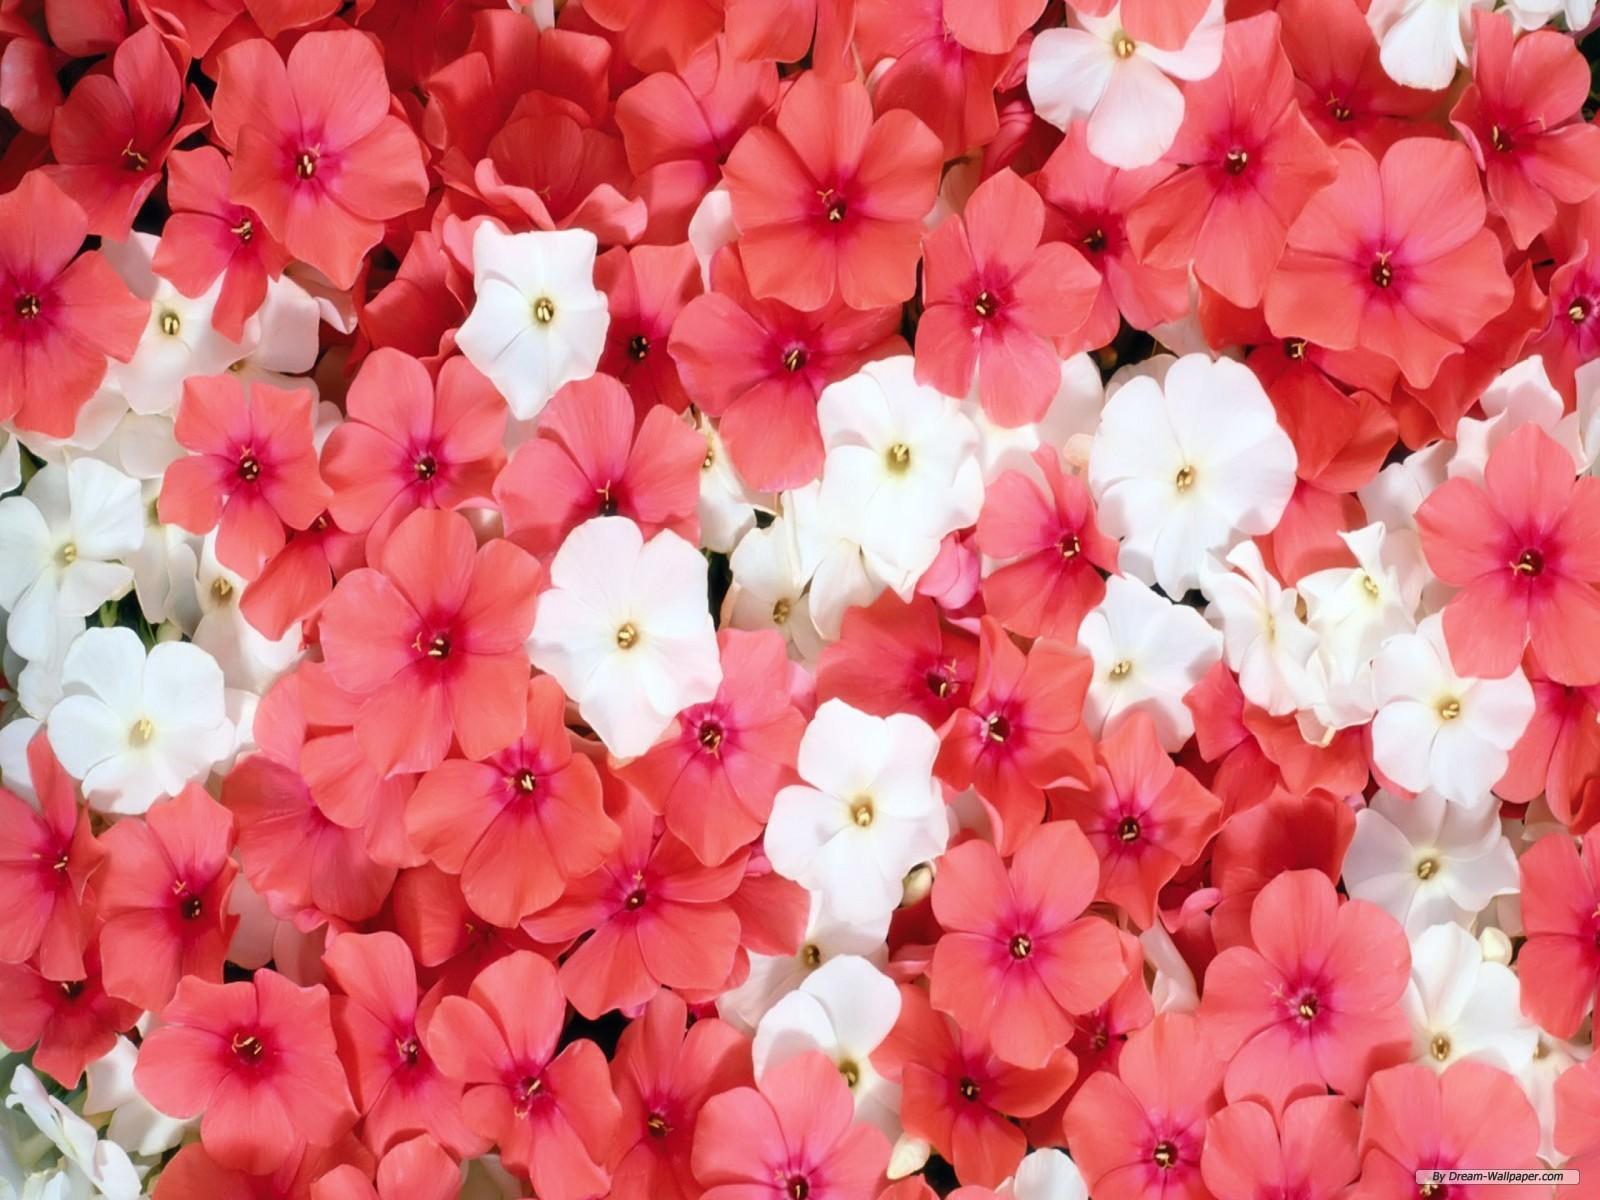 BeautyFul Flowers beautiful flowers background wallpapers 1600x1200